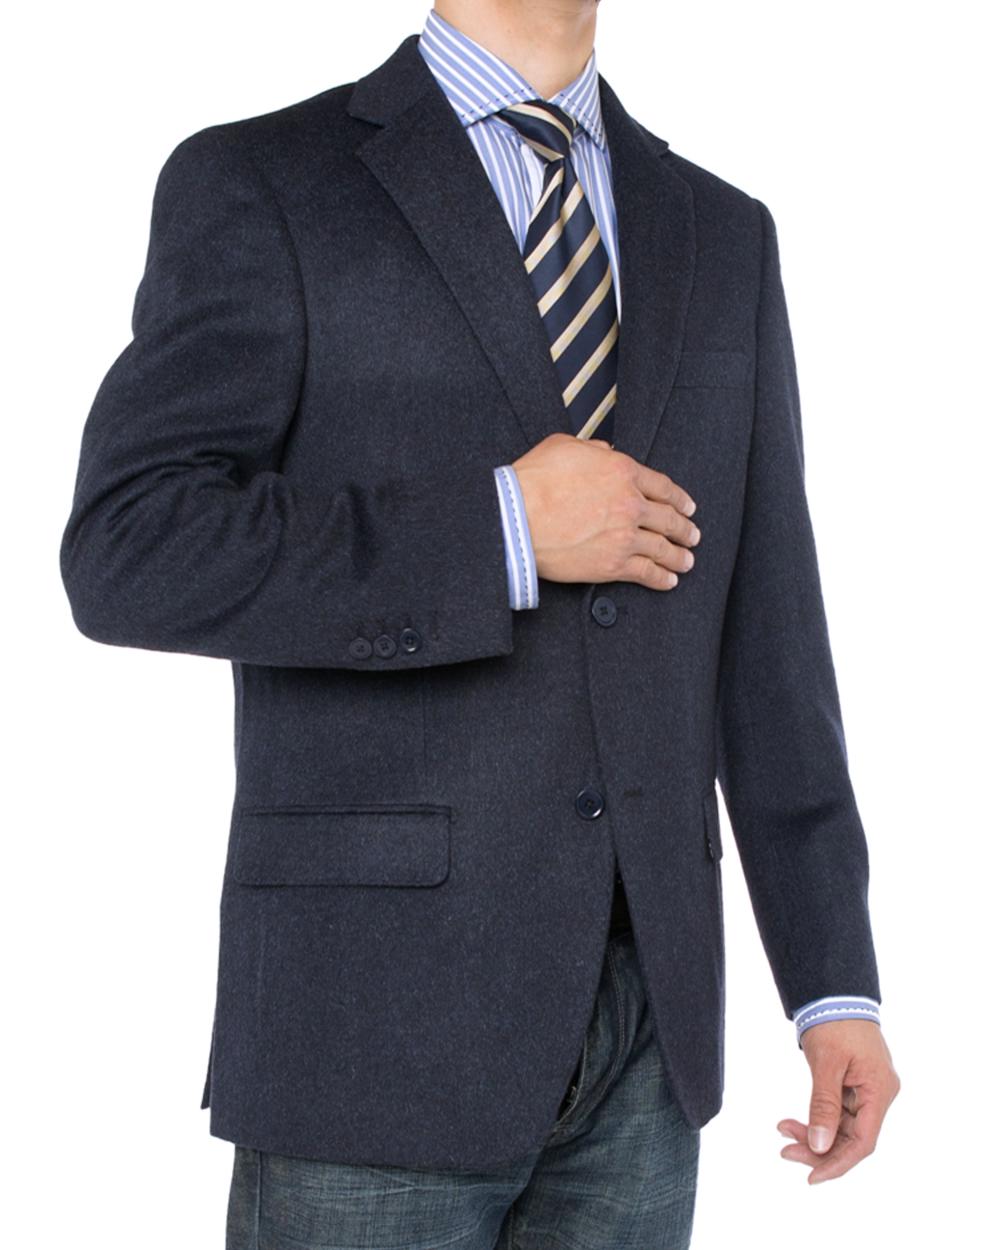 Luciano Natazzi Mens 2 Button Luxe Camel Hair Suit Jacket Sport Coat Blazer